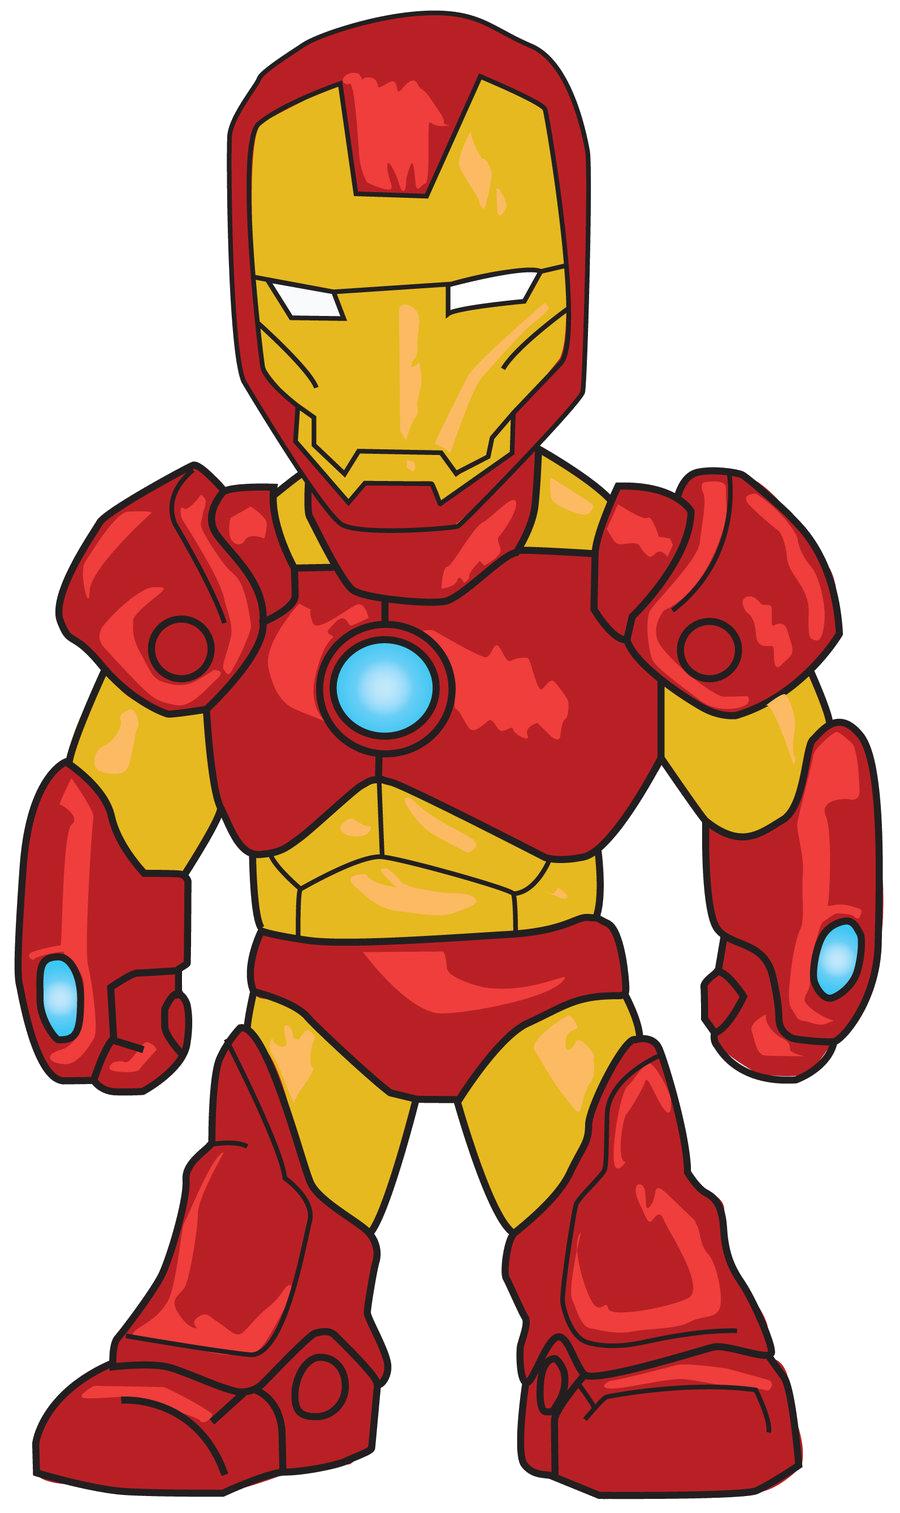 Ironman clipart graphic free stock Cartoon Iron Man Clip Art Png graphic free stock